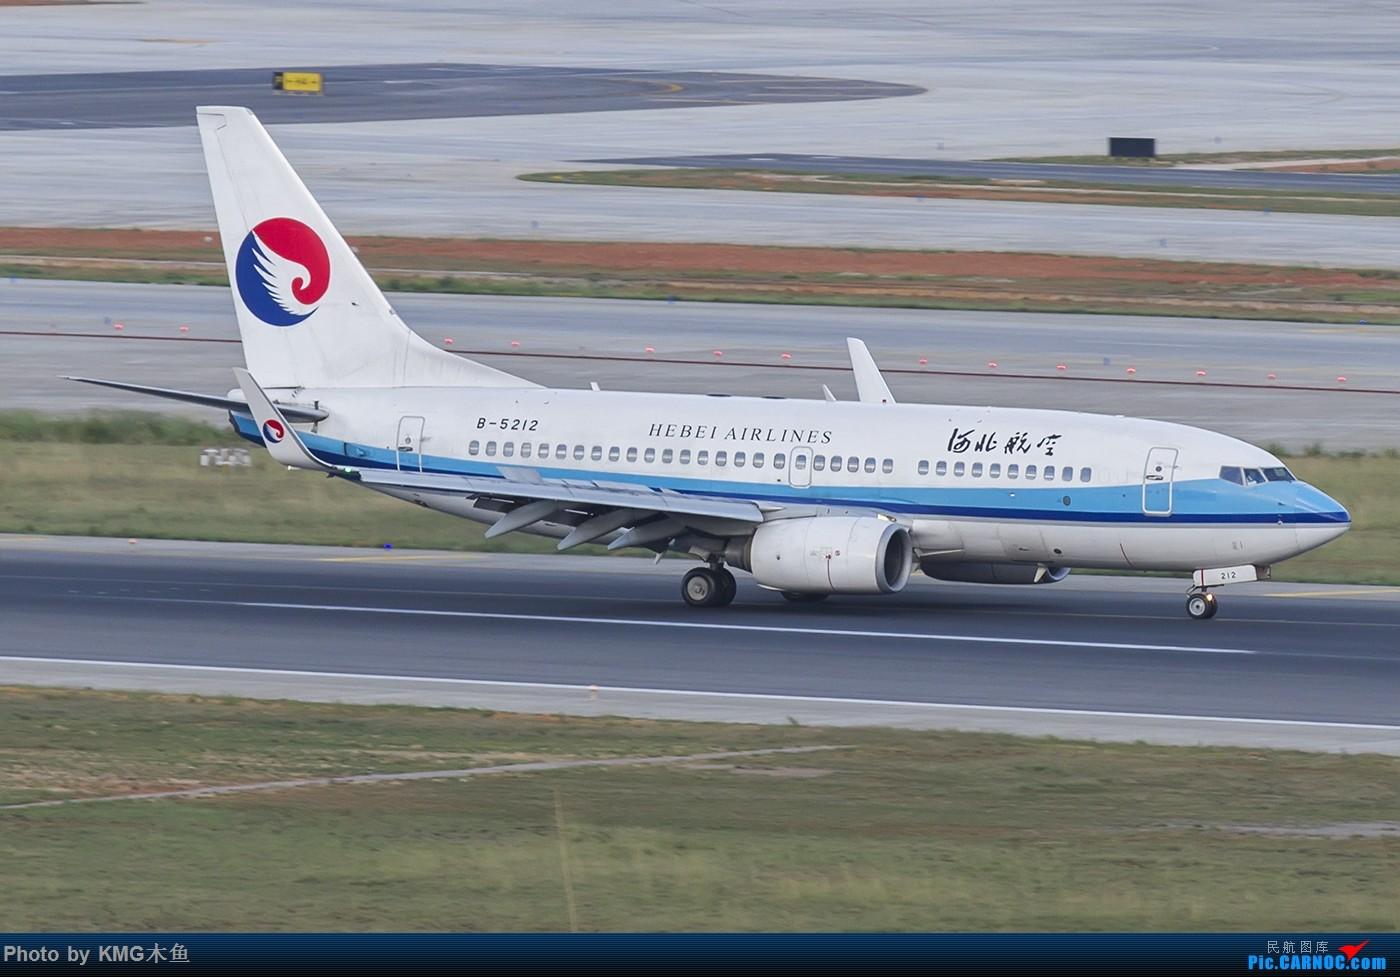 Re:【昆明长水国际机场-KMG木鱼拍机】为啥PS图片很清晰,上传以后图像变虚了。